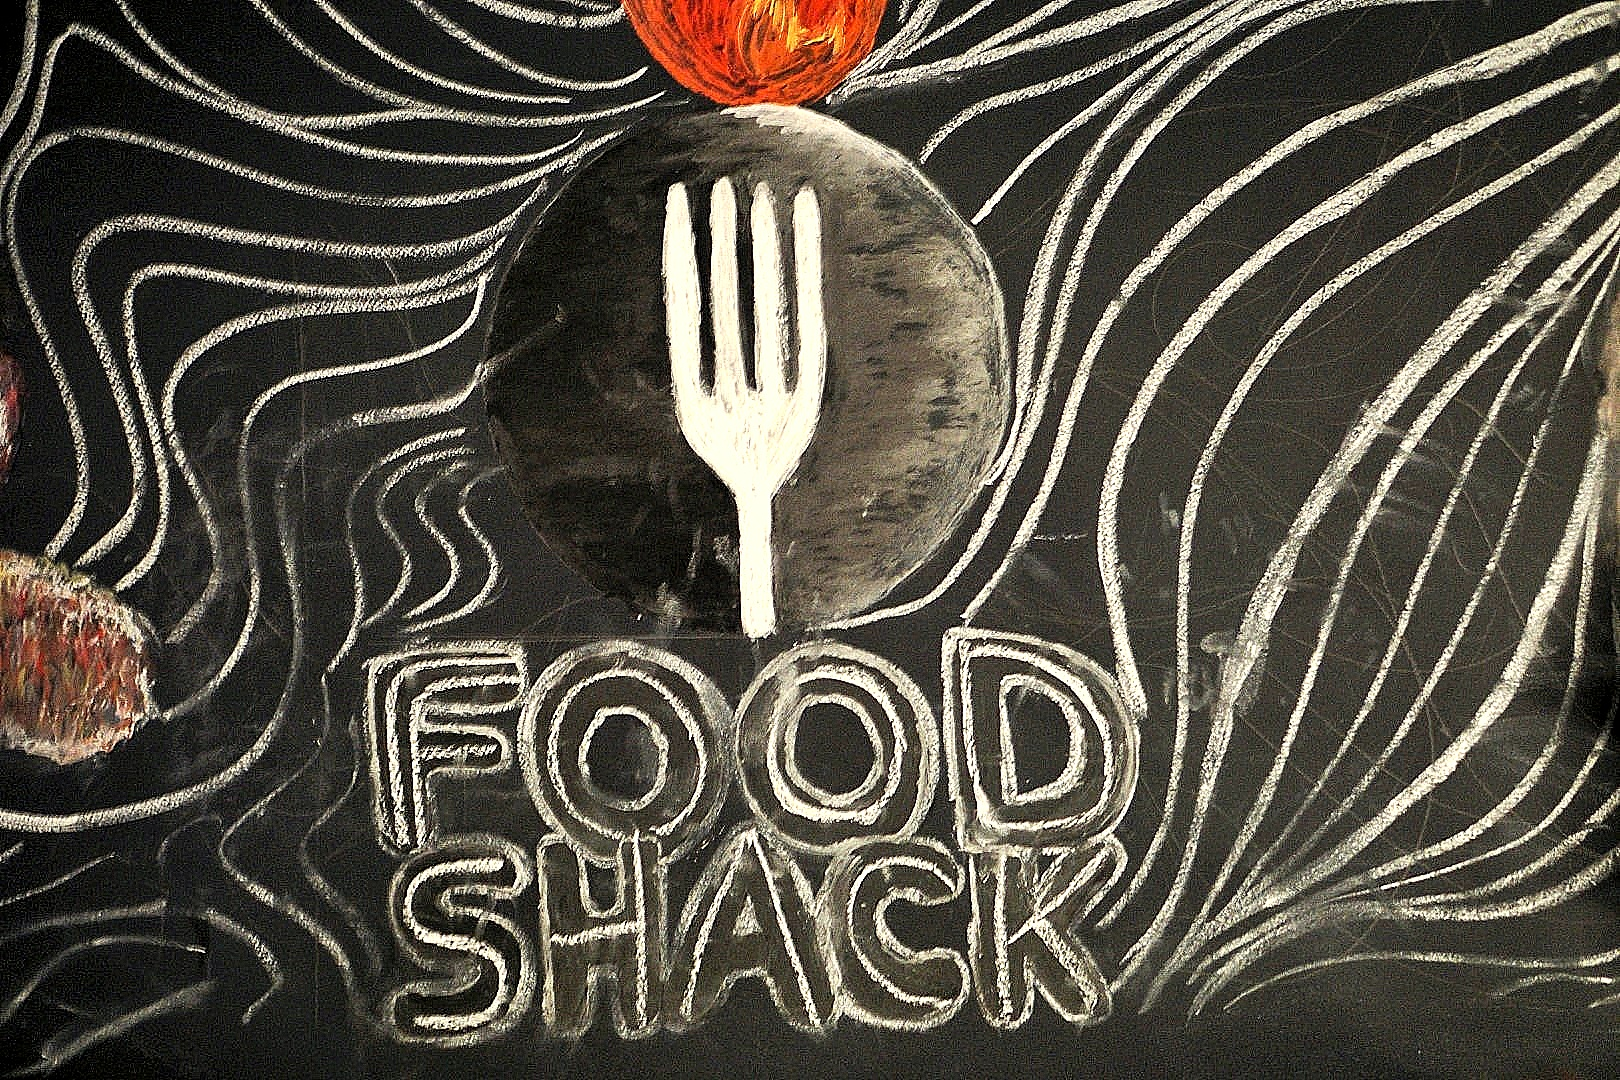 Food shack Lagos, victoria island decor